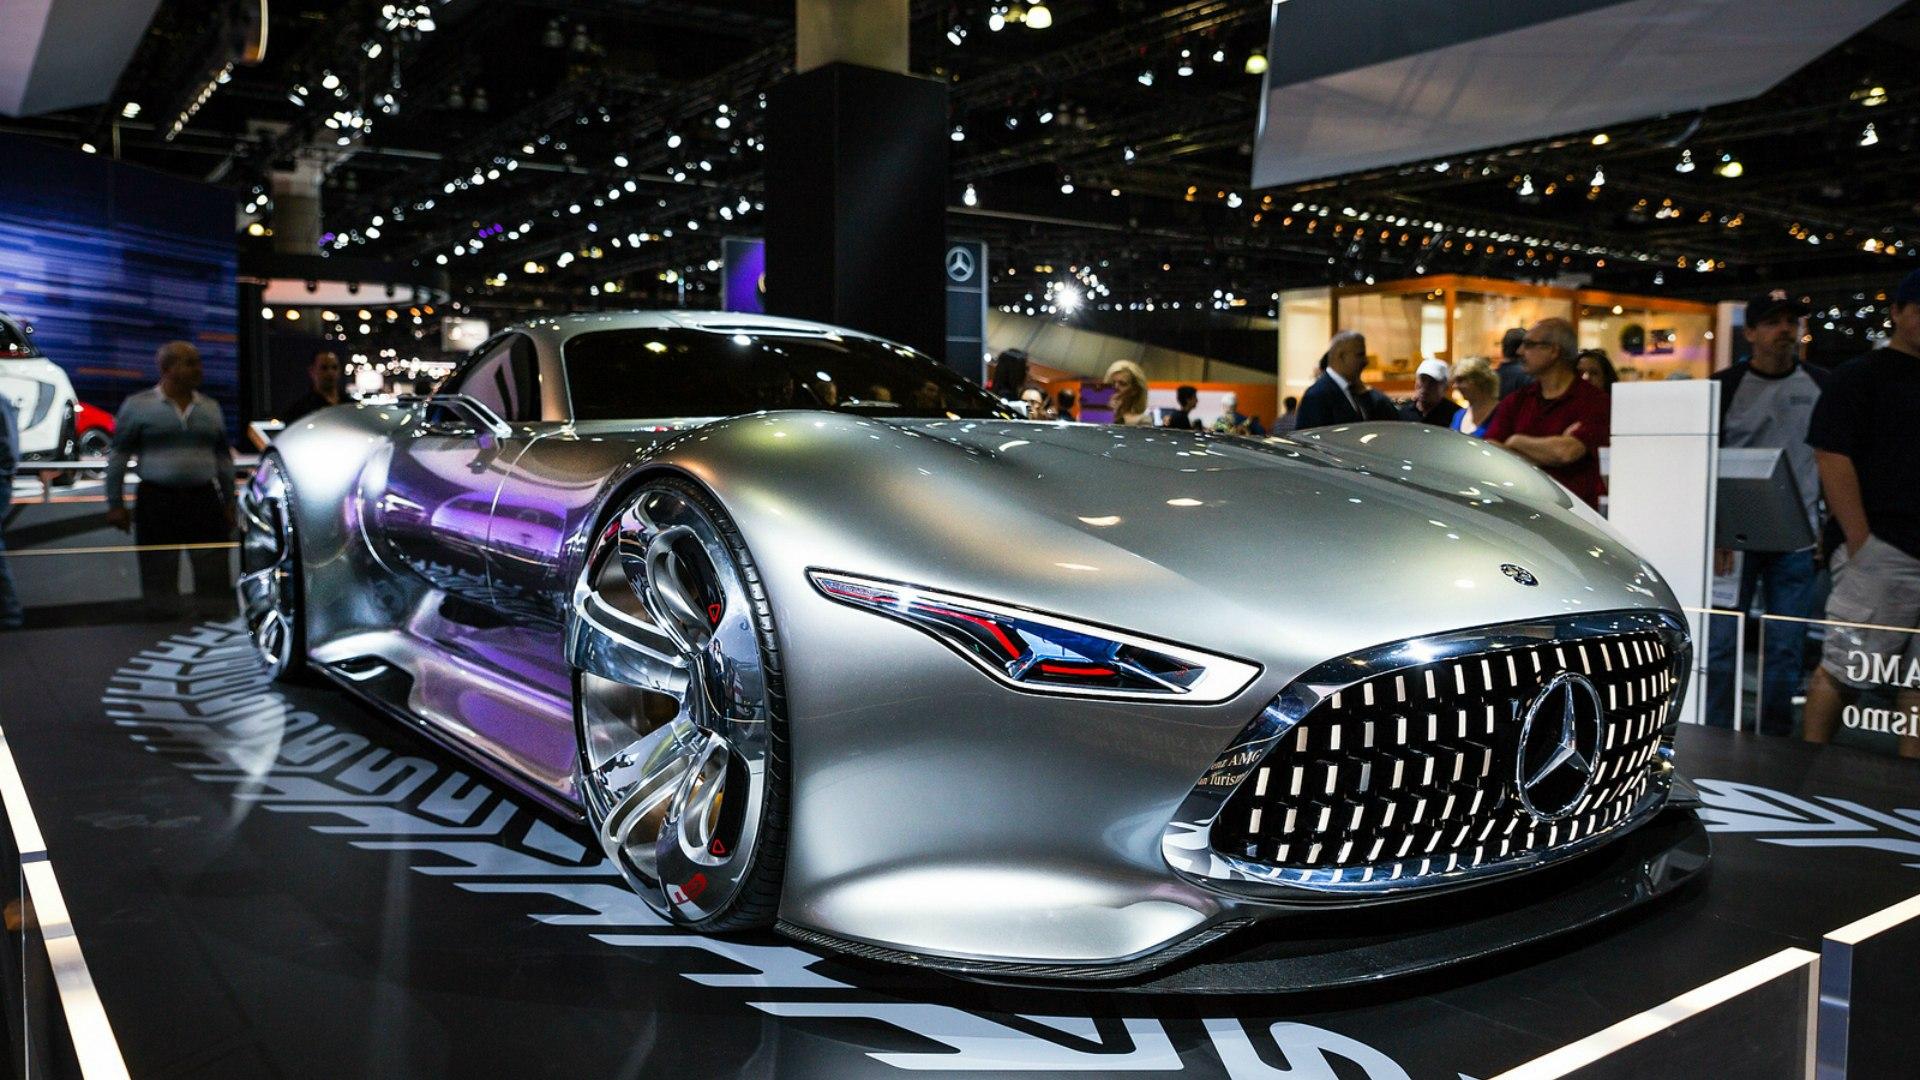 Striking mercedes benz amg vision gran turismo wallpapers for Mercedes benz amg vision gran turismo